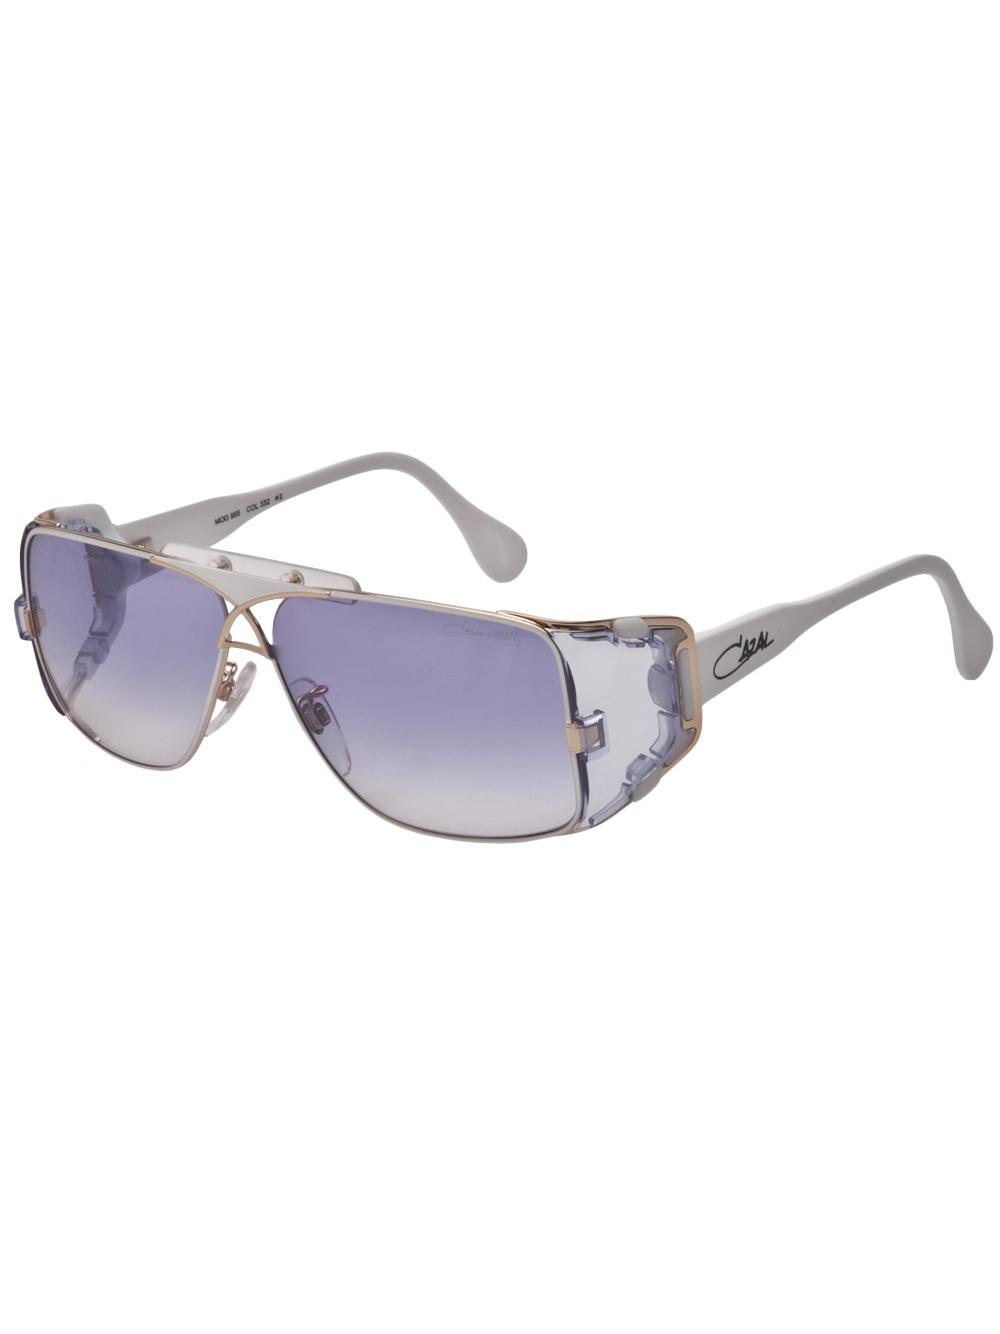 330cefdfef8 Lyst - Cazal Vintage 955 Sunglasses in Blue for Men